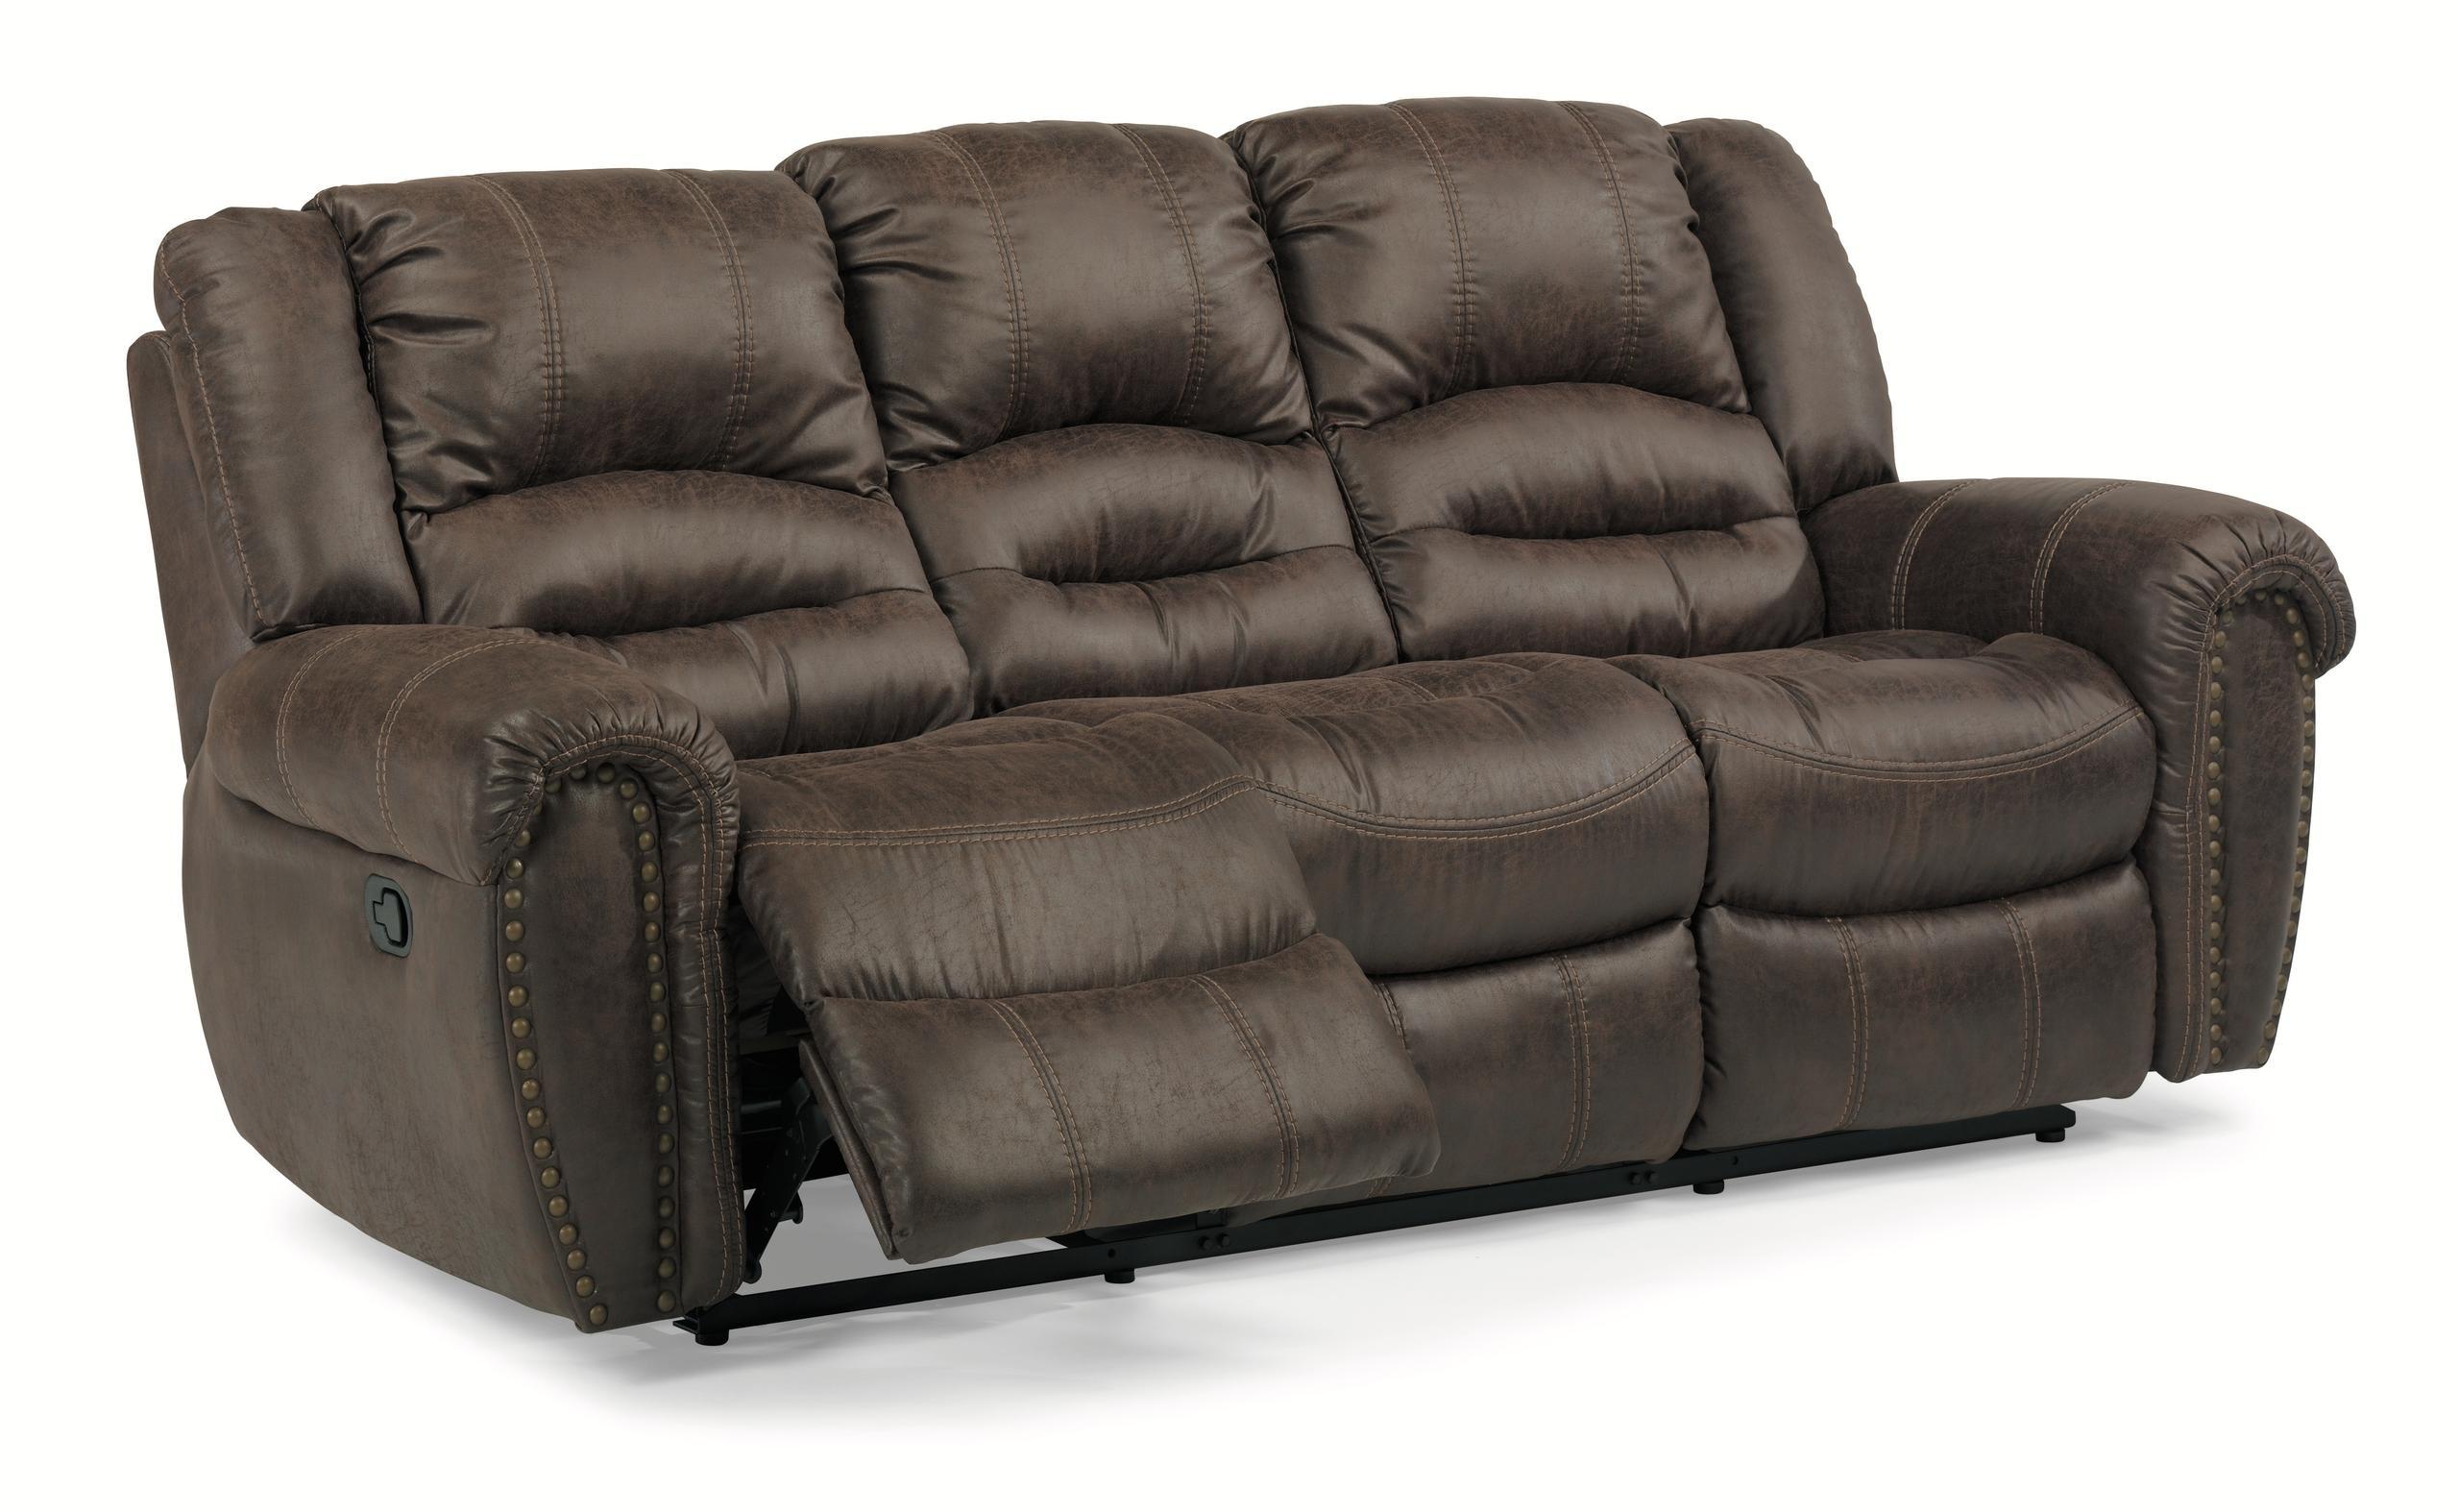 FlexsteelTown Reclining Sofa